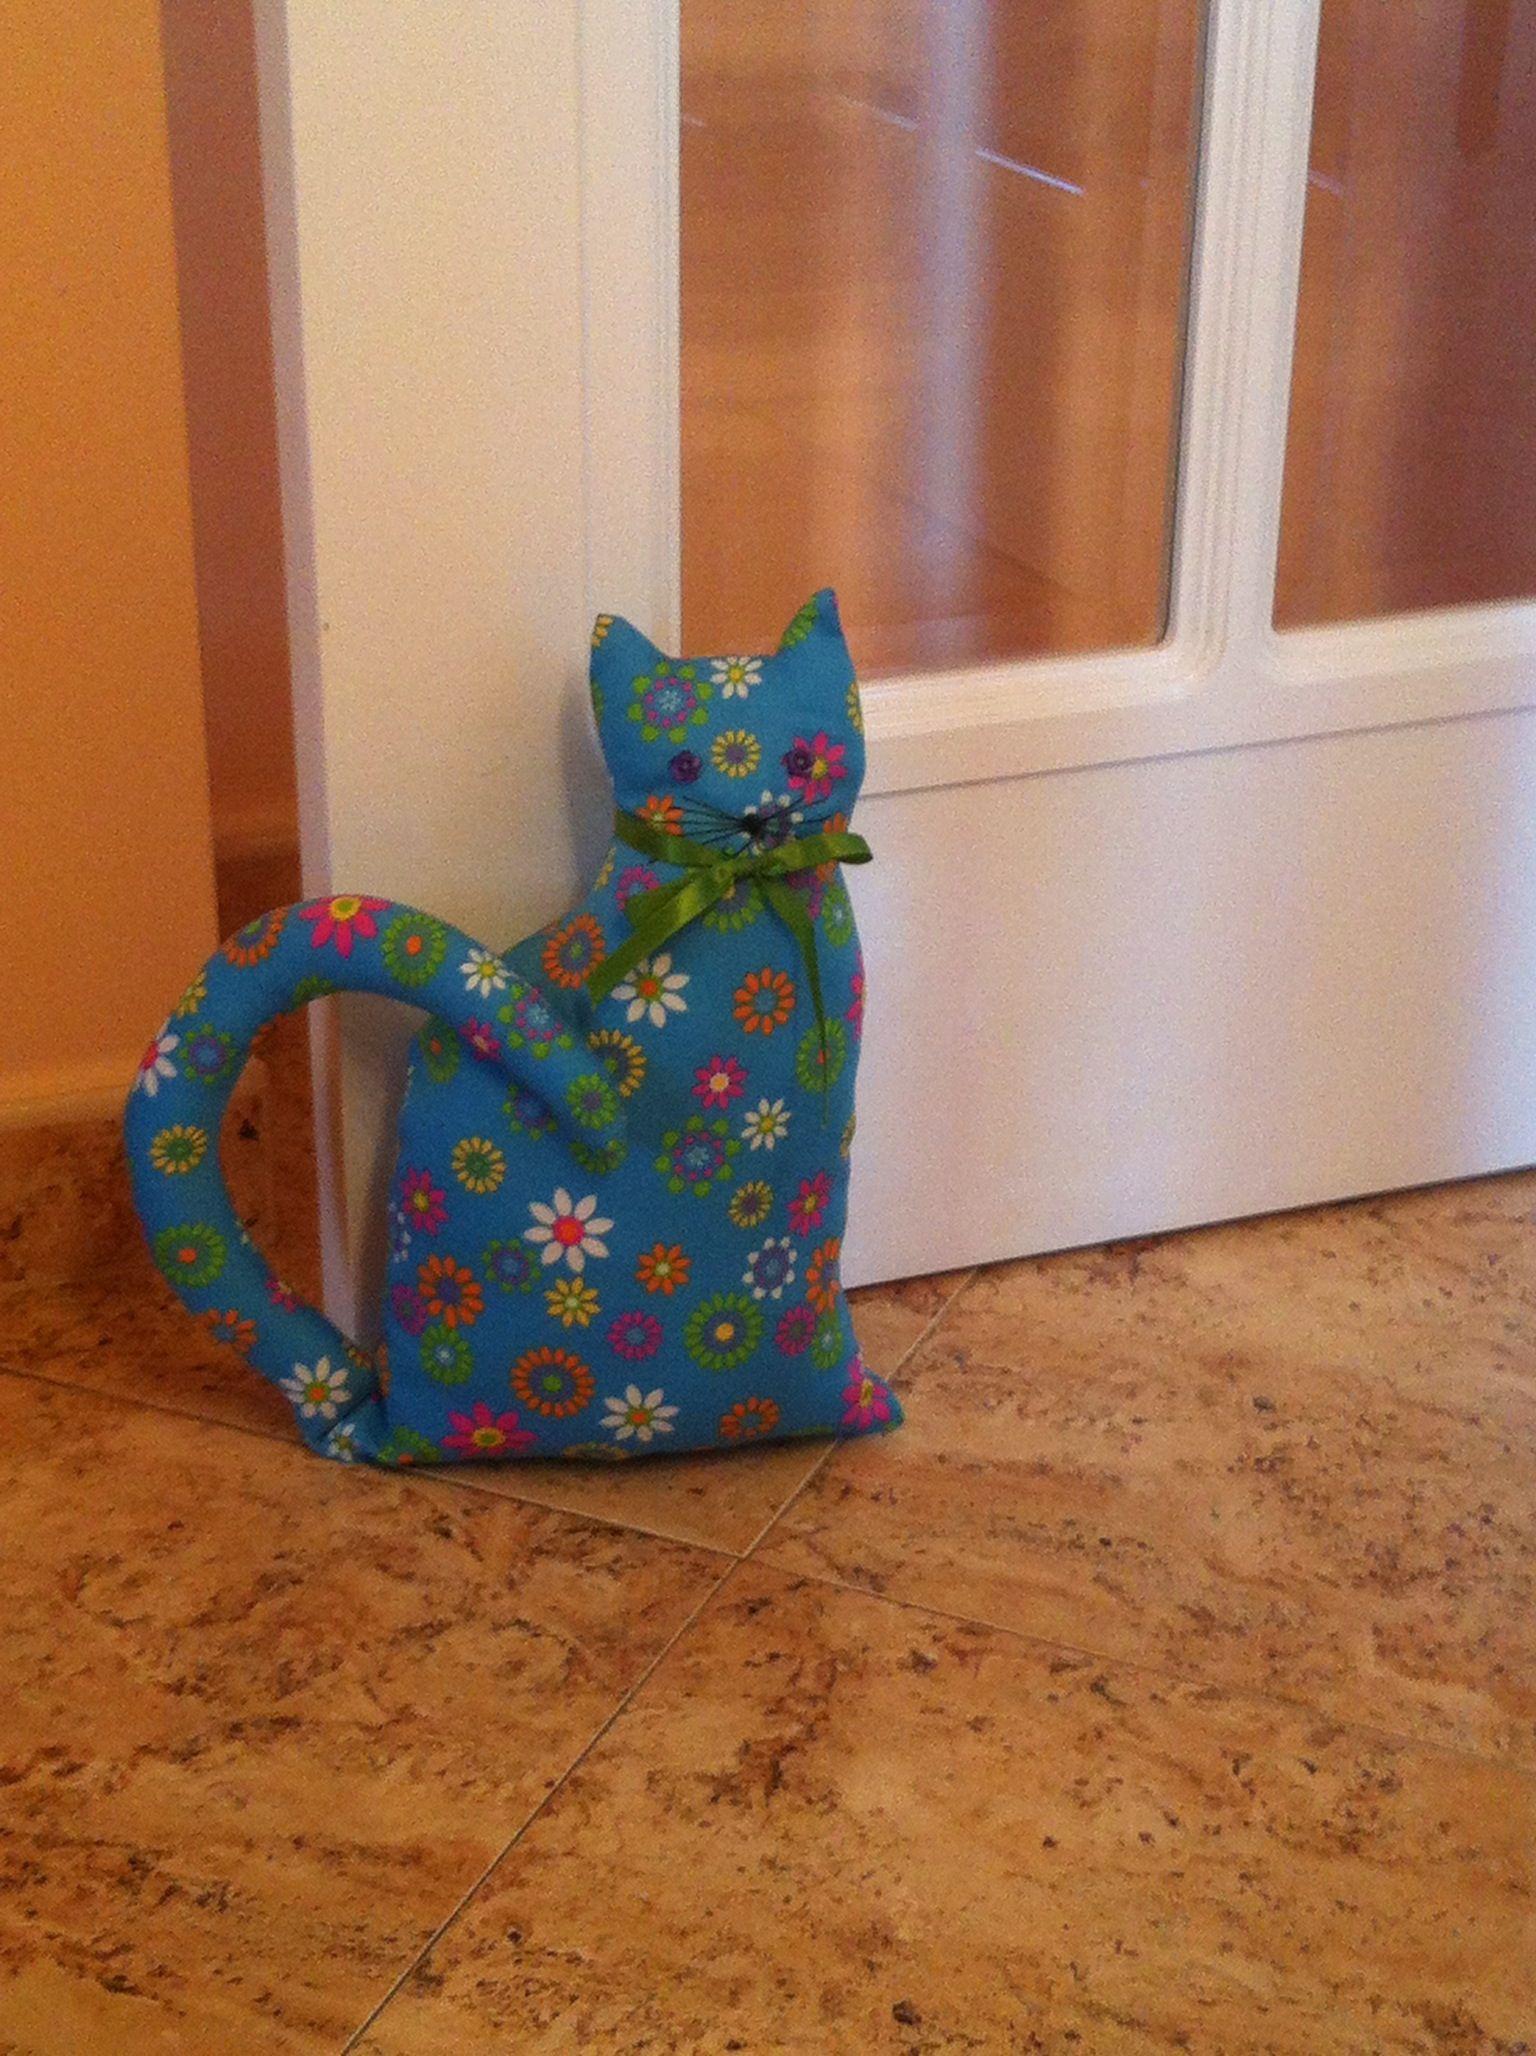 Gato sujeta puertas | simple quimera | Pinterest | Gato, Peso de ...